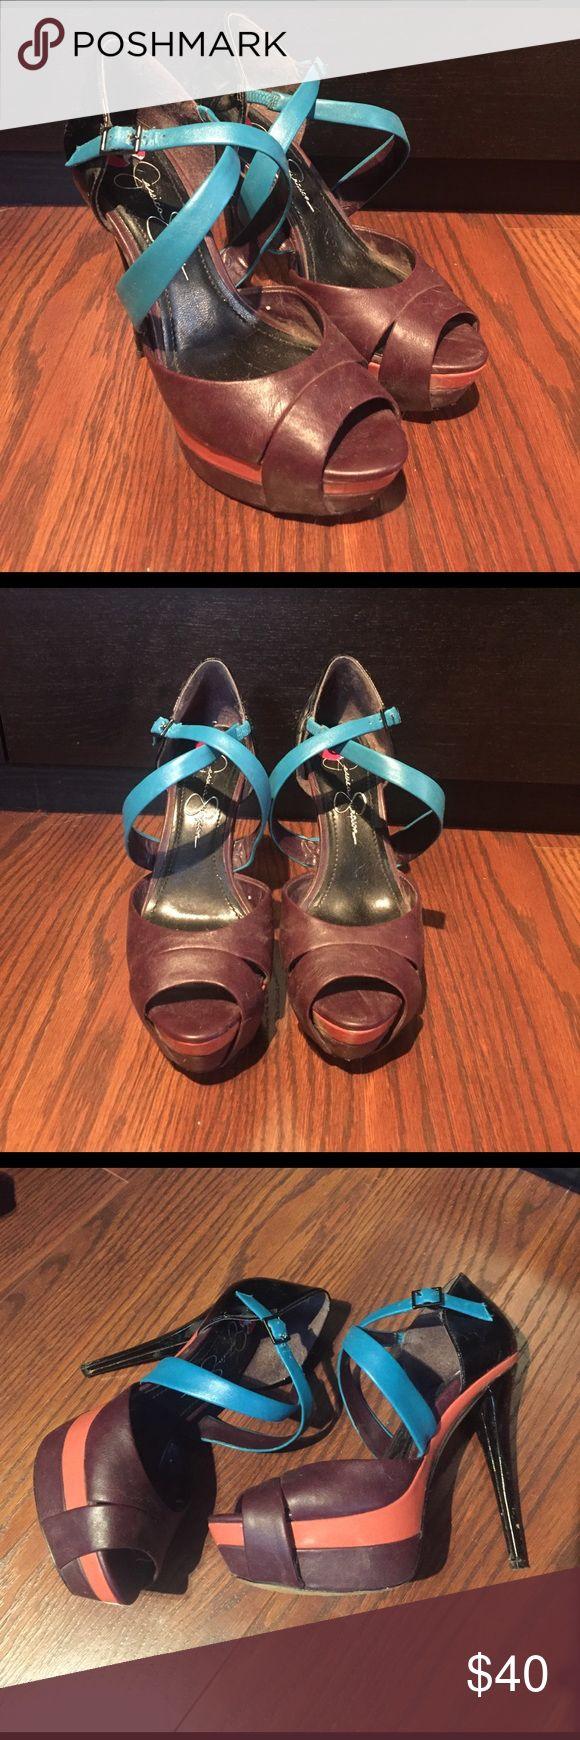 Jessica Simpson Heels Gently worn. Jessica Simpson heels. Jessica Simpson Shoes Heels